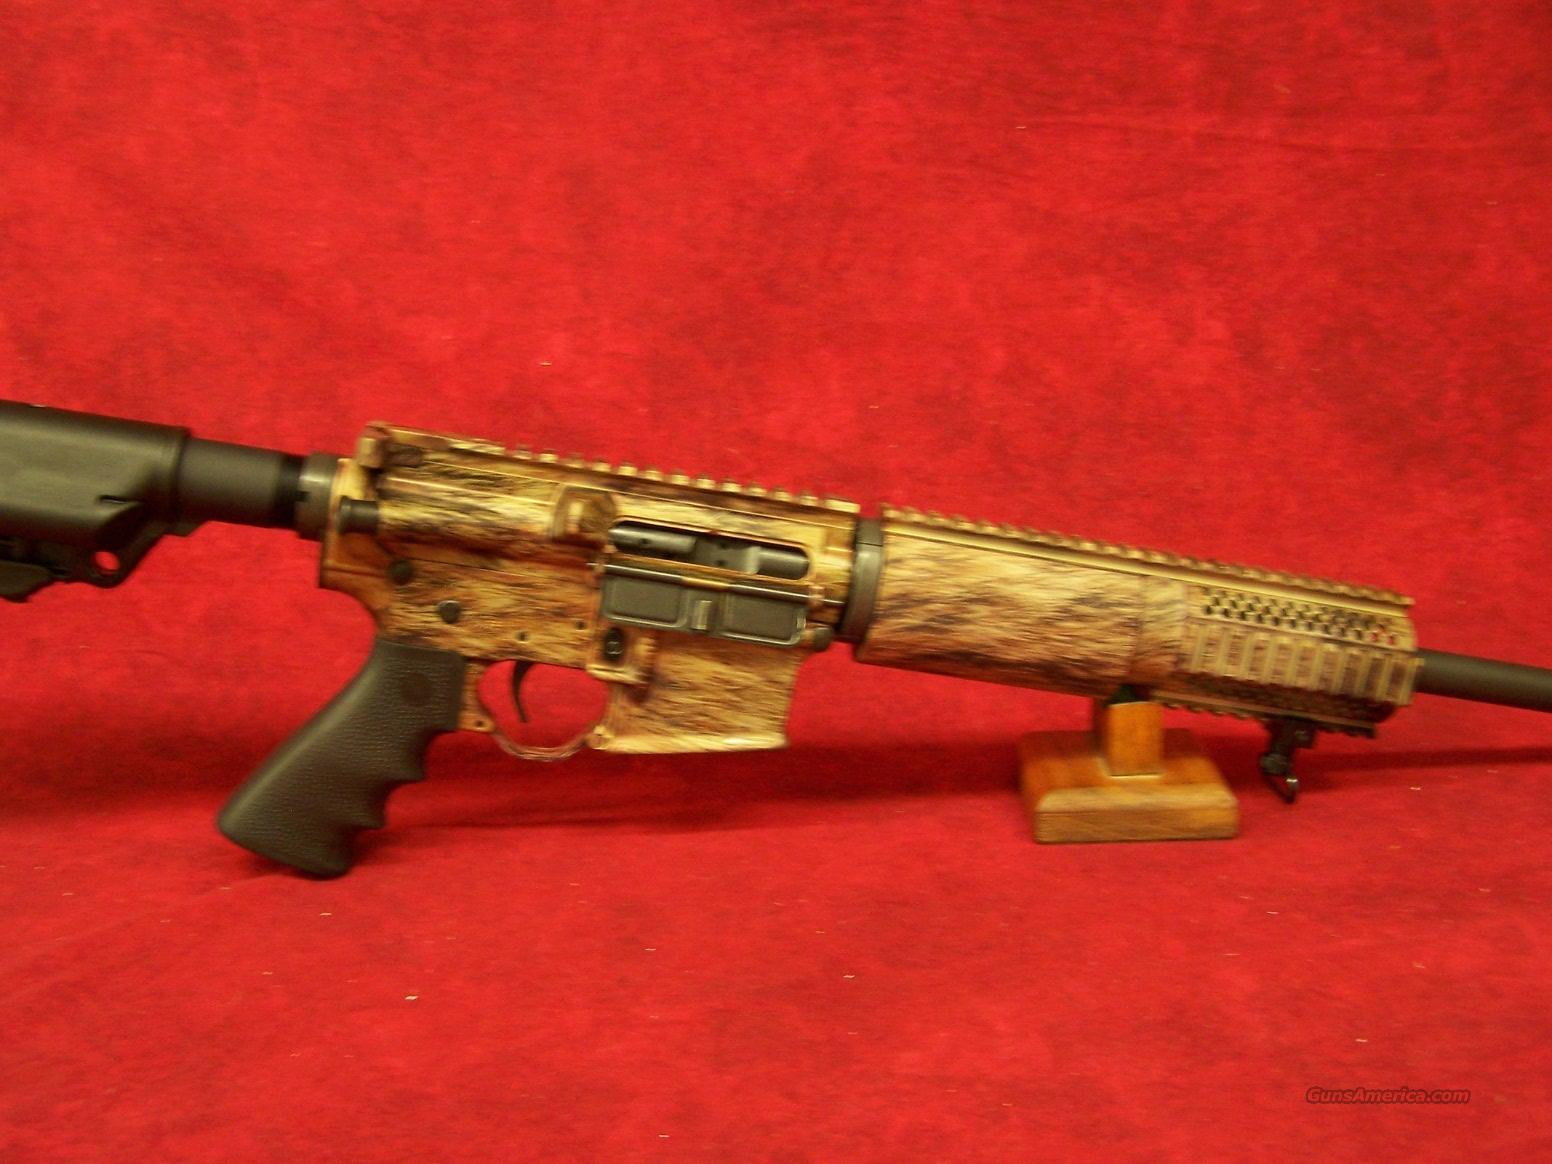 Rock River Arms LAR-15 Hunter WYL-Ehide finish 5.56mm-.223Rem  Guns > Rifles > Rock River Arms Rifles